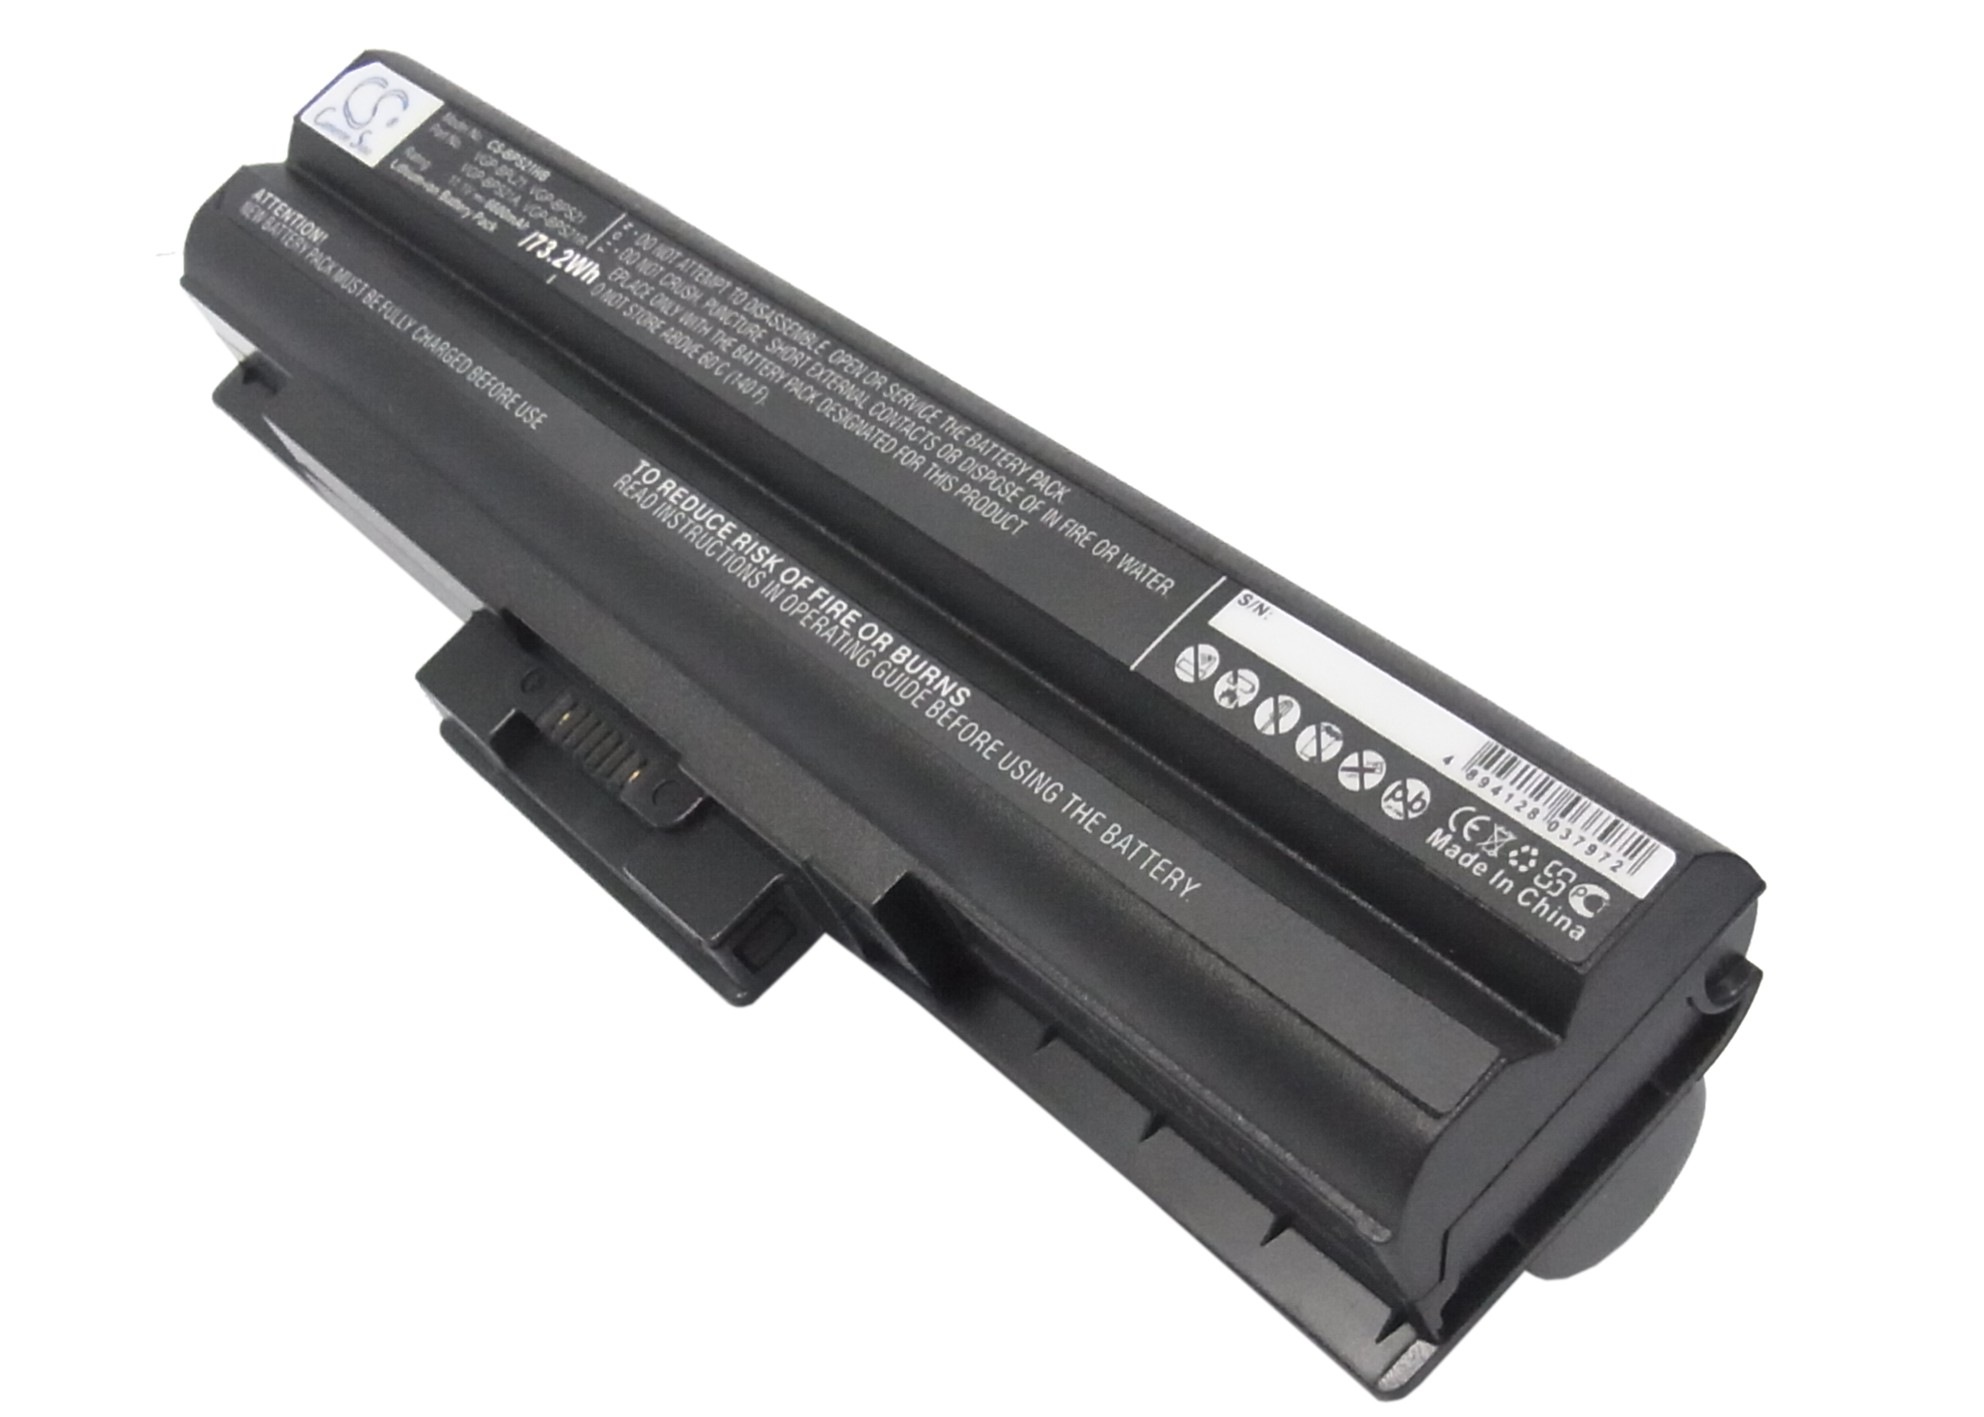 Cameron Sino baterie do notebooků pro SONY VAIO VPCF11Z1E 11.1V Li-ion 6600mAh černá - neoriginální